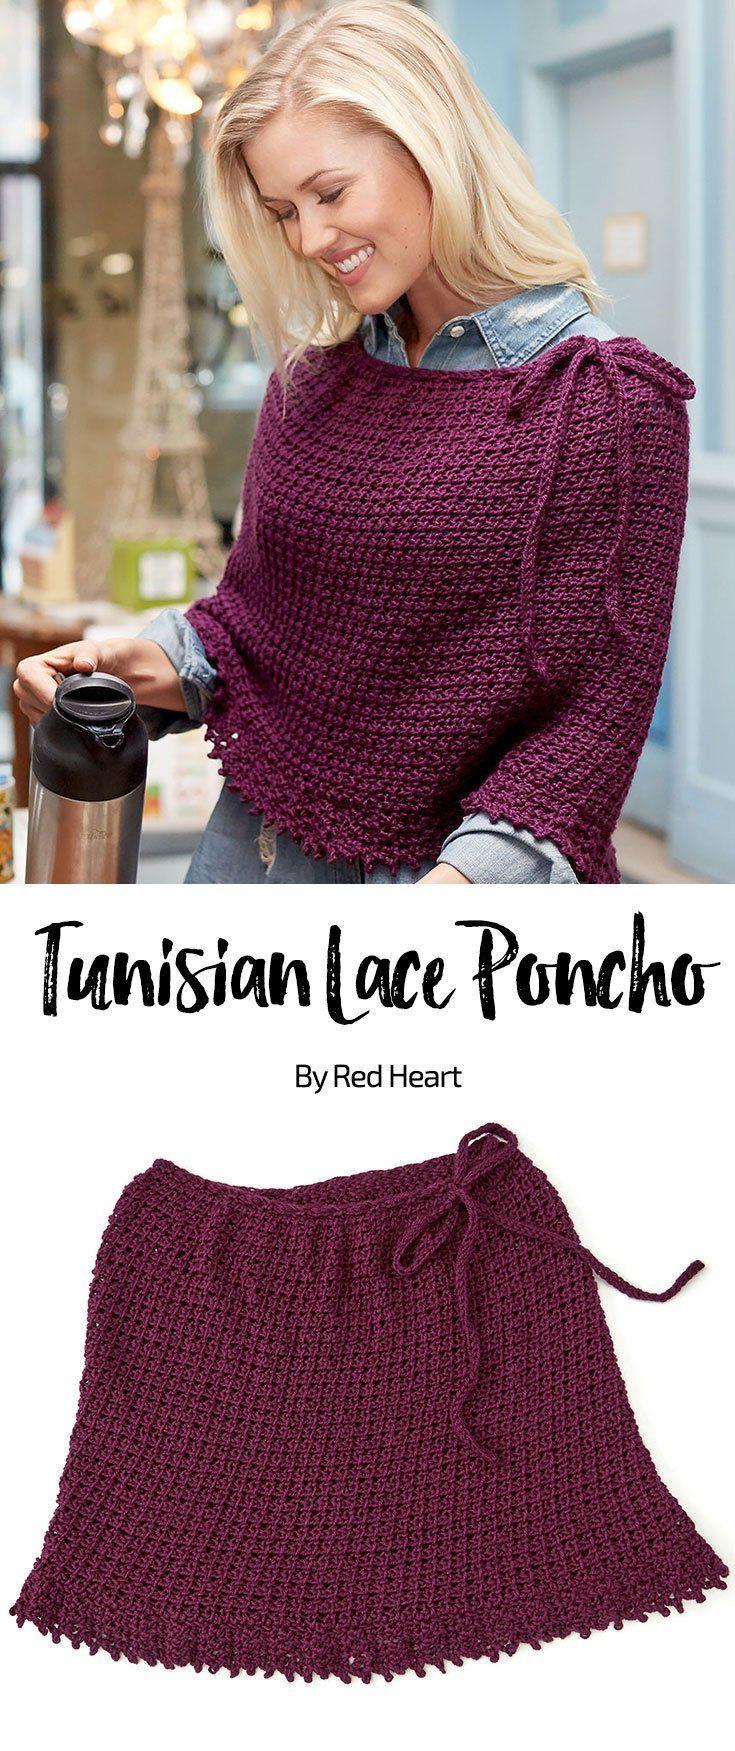 Tunisian Lace Poncho free crochet pattern in Soft yarn.